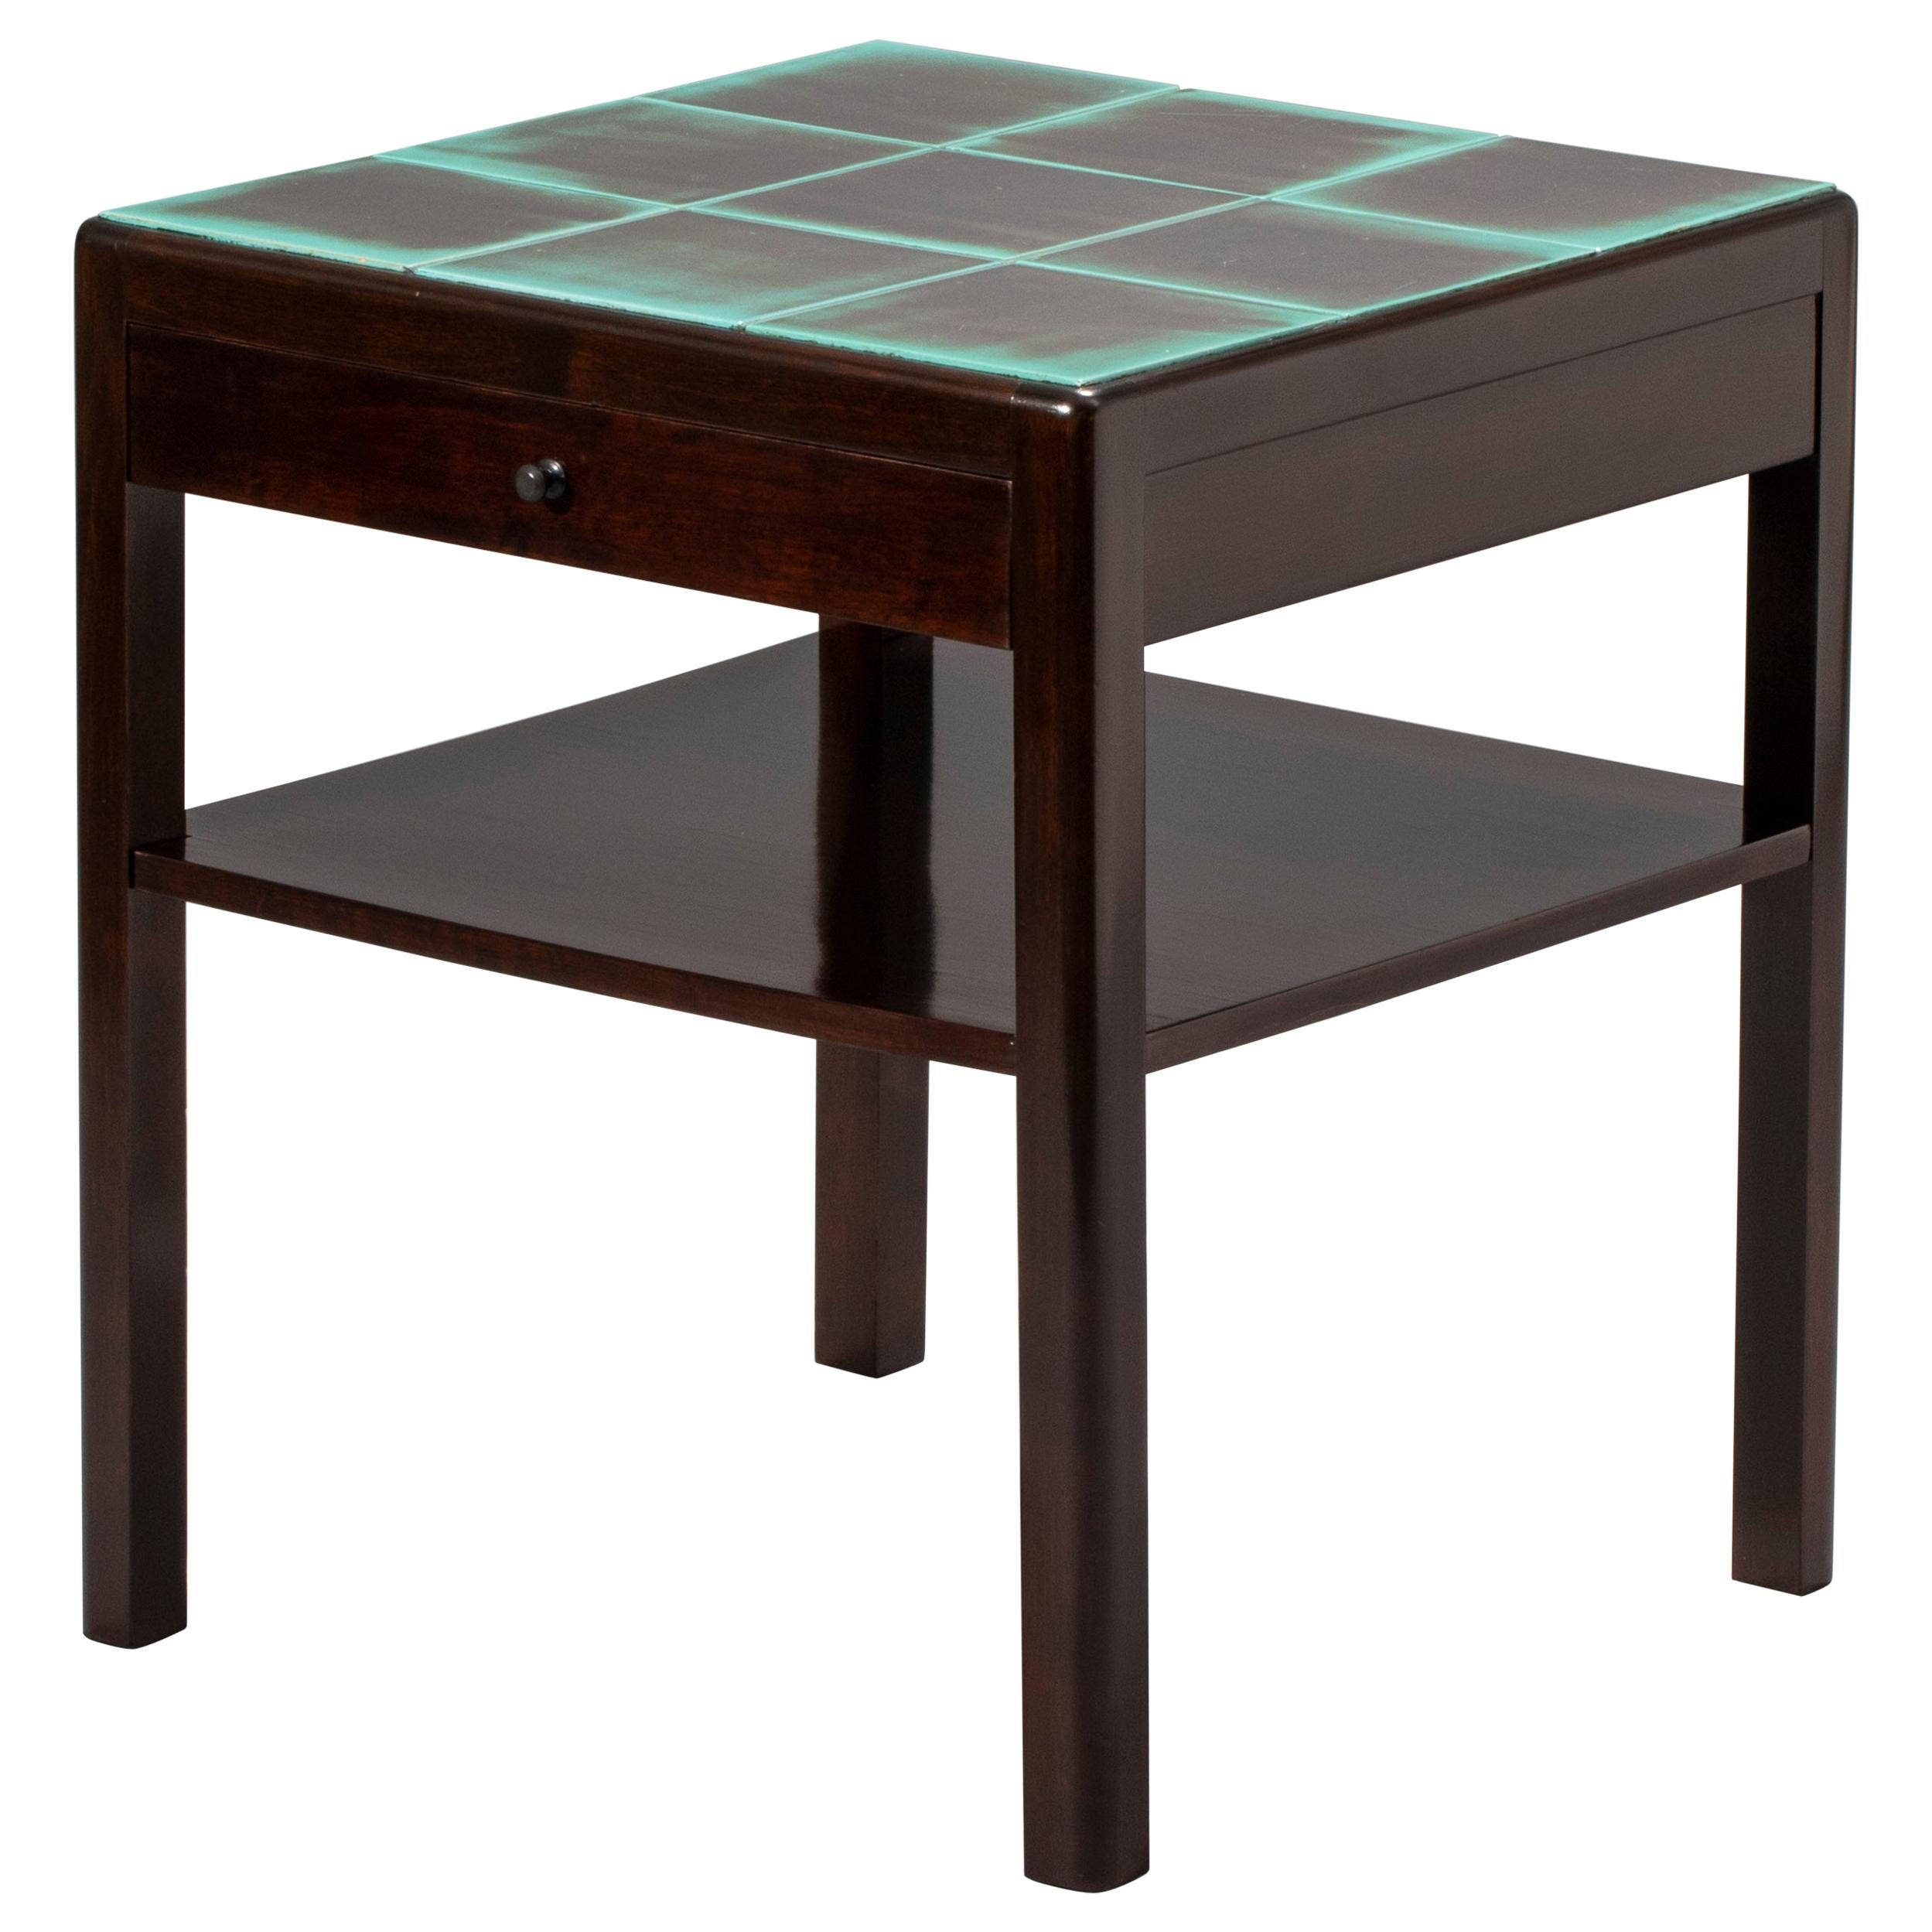 Reiners Möblefabrik, Swedish Art Deco Ebonized Birch & Turquoise Tile-Top Table